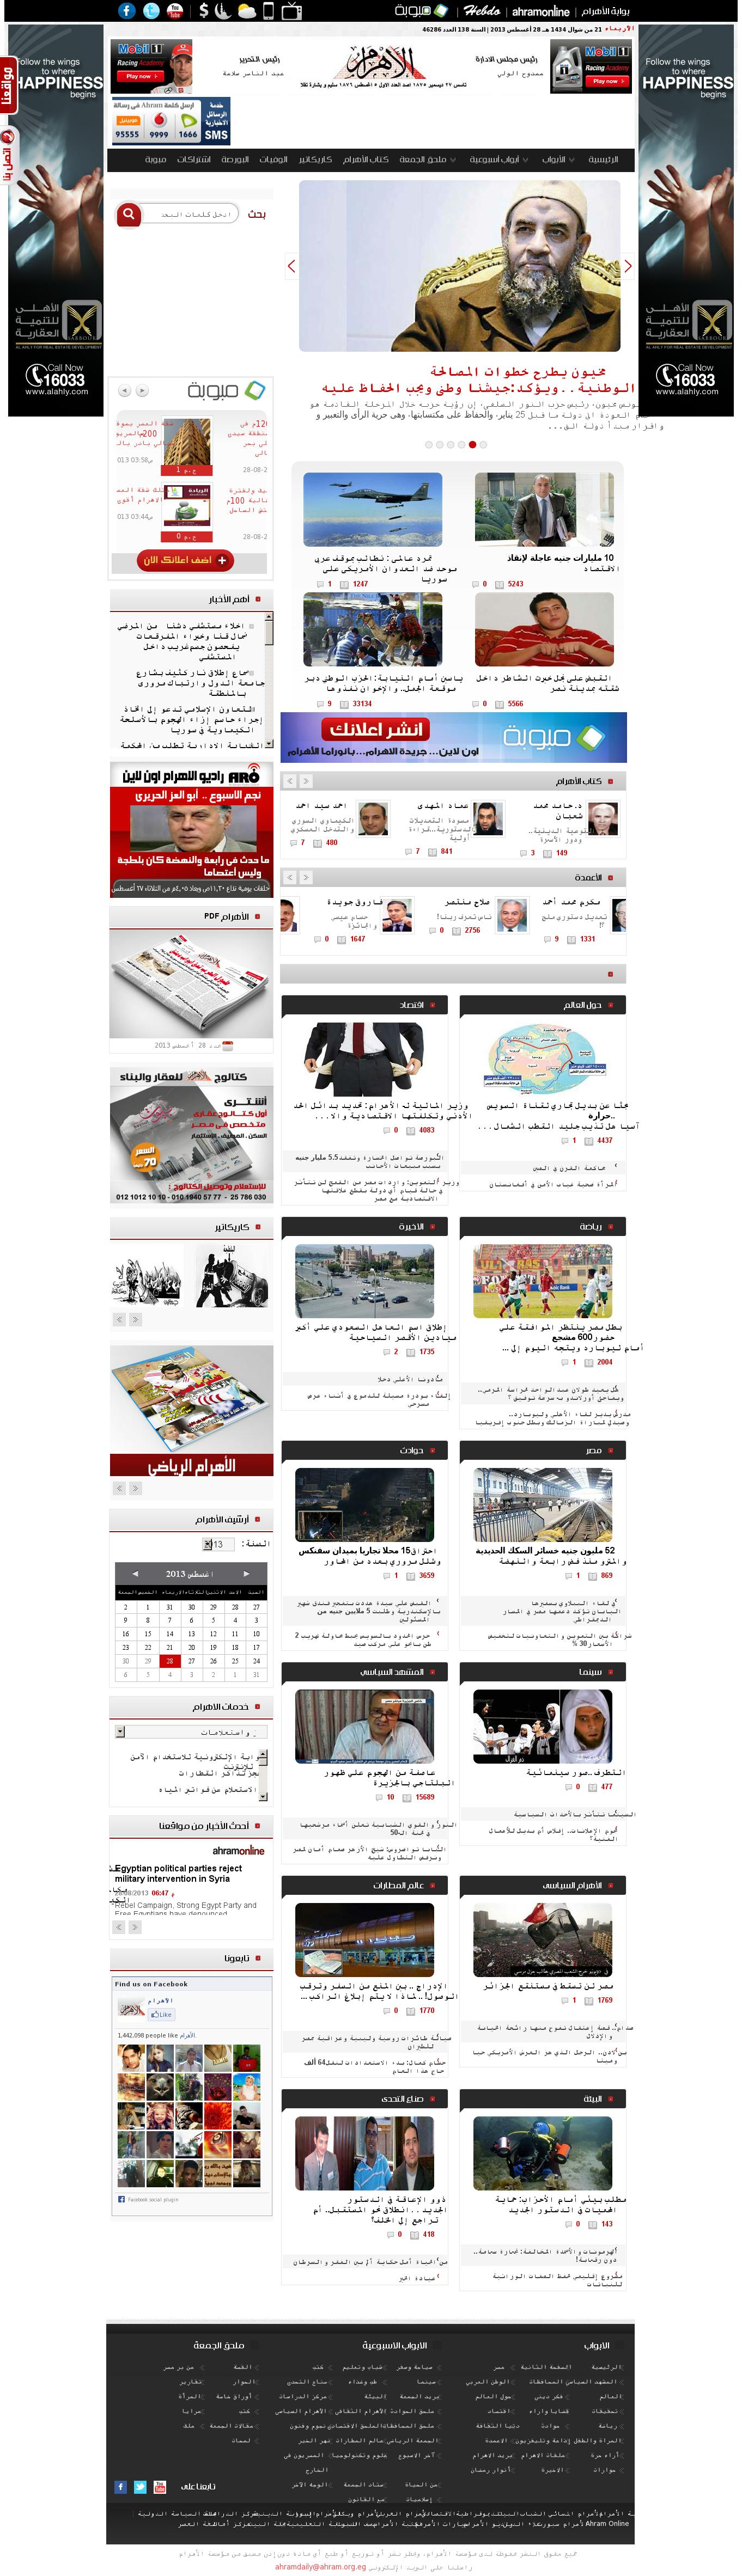 Al-Ahram at Wednesday Aug. 28, 2013, 8 p.m. UTC